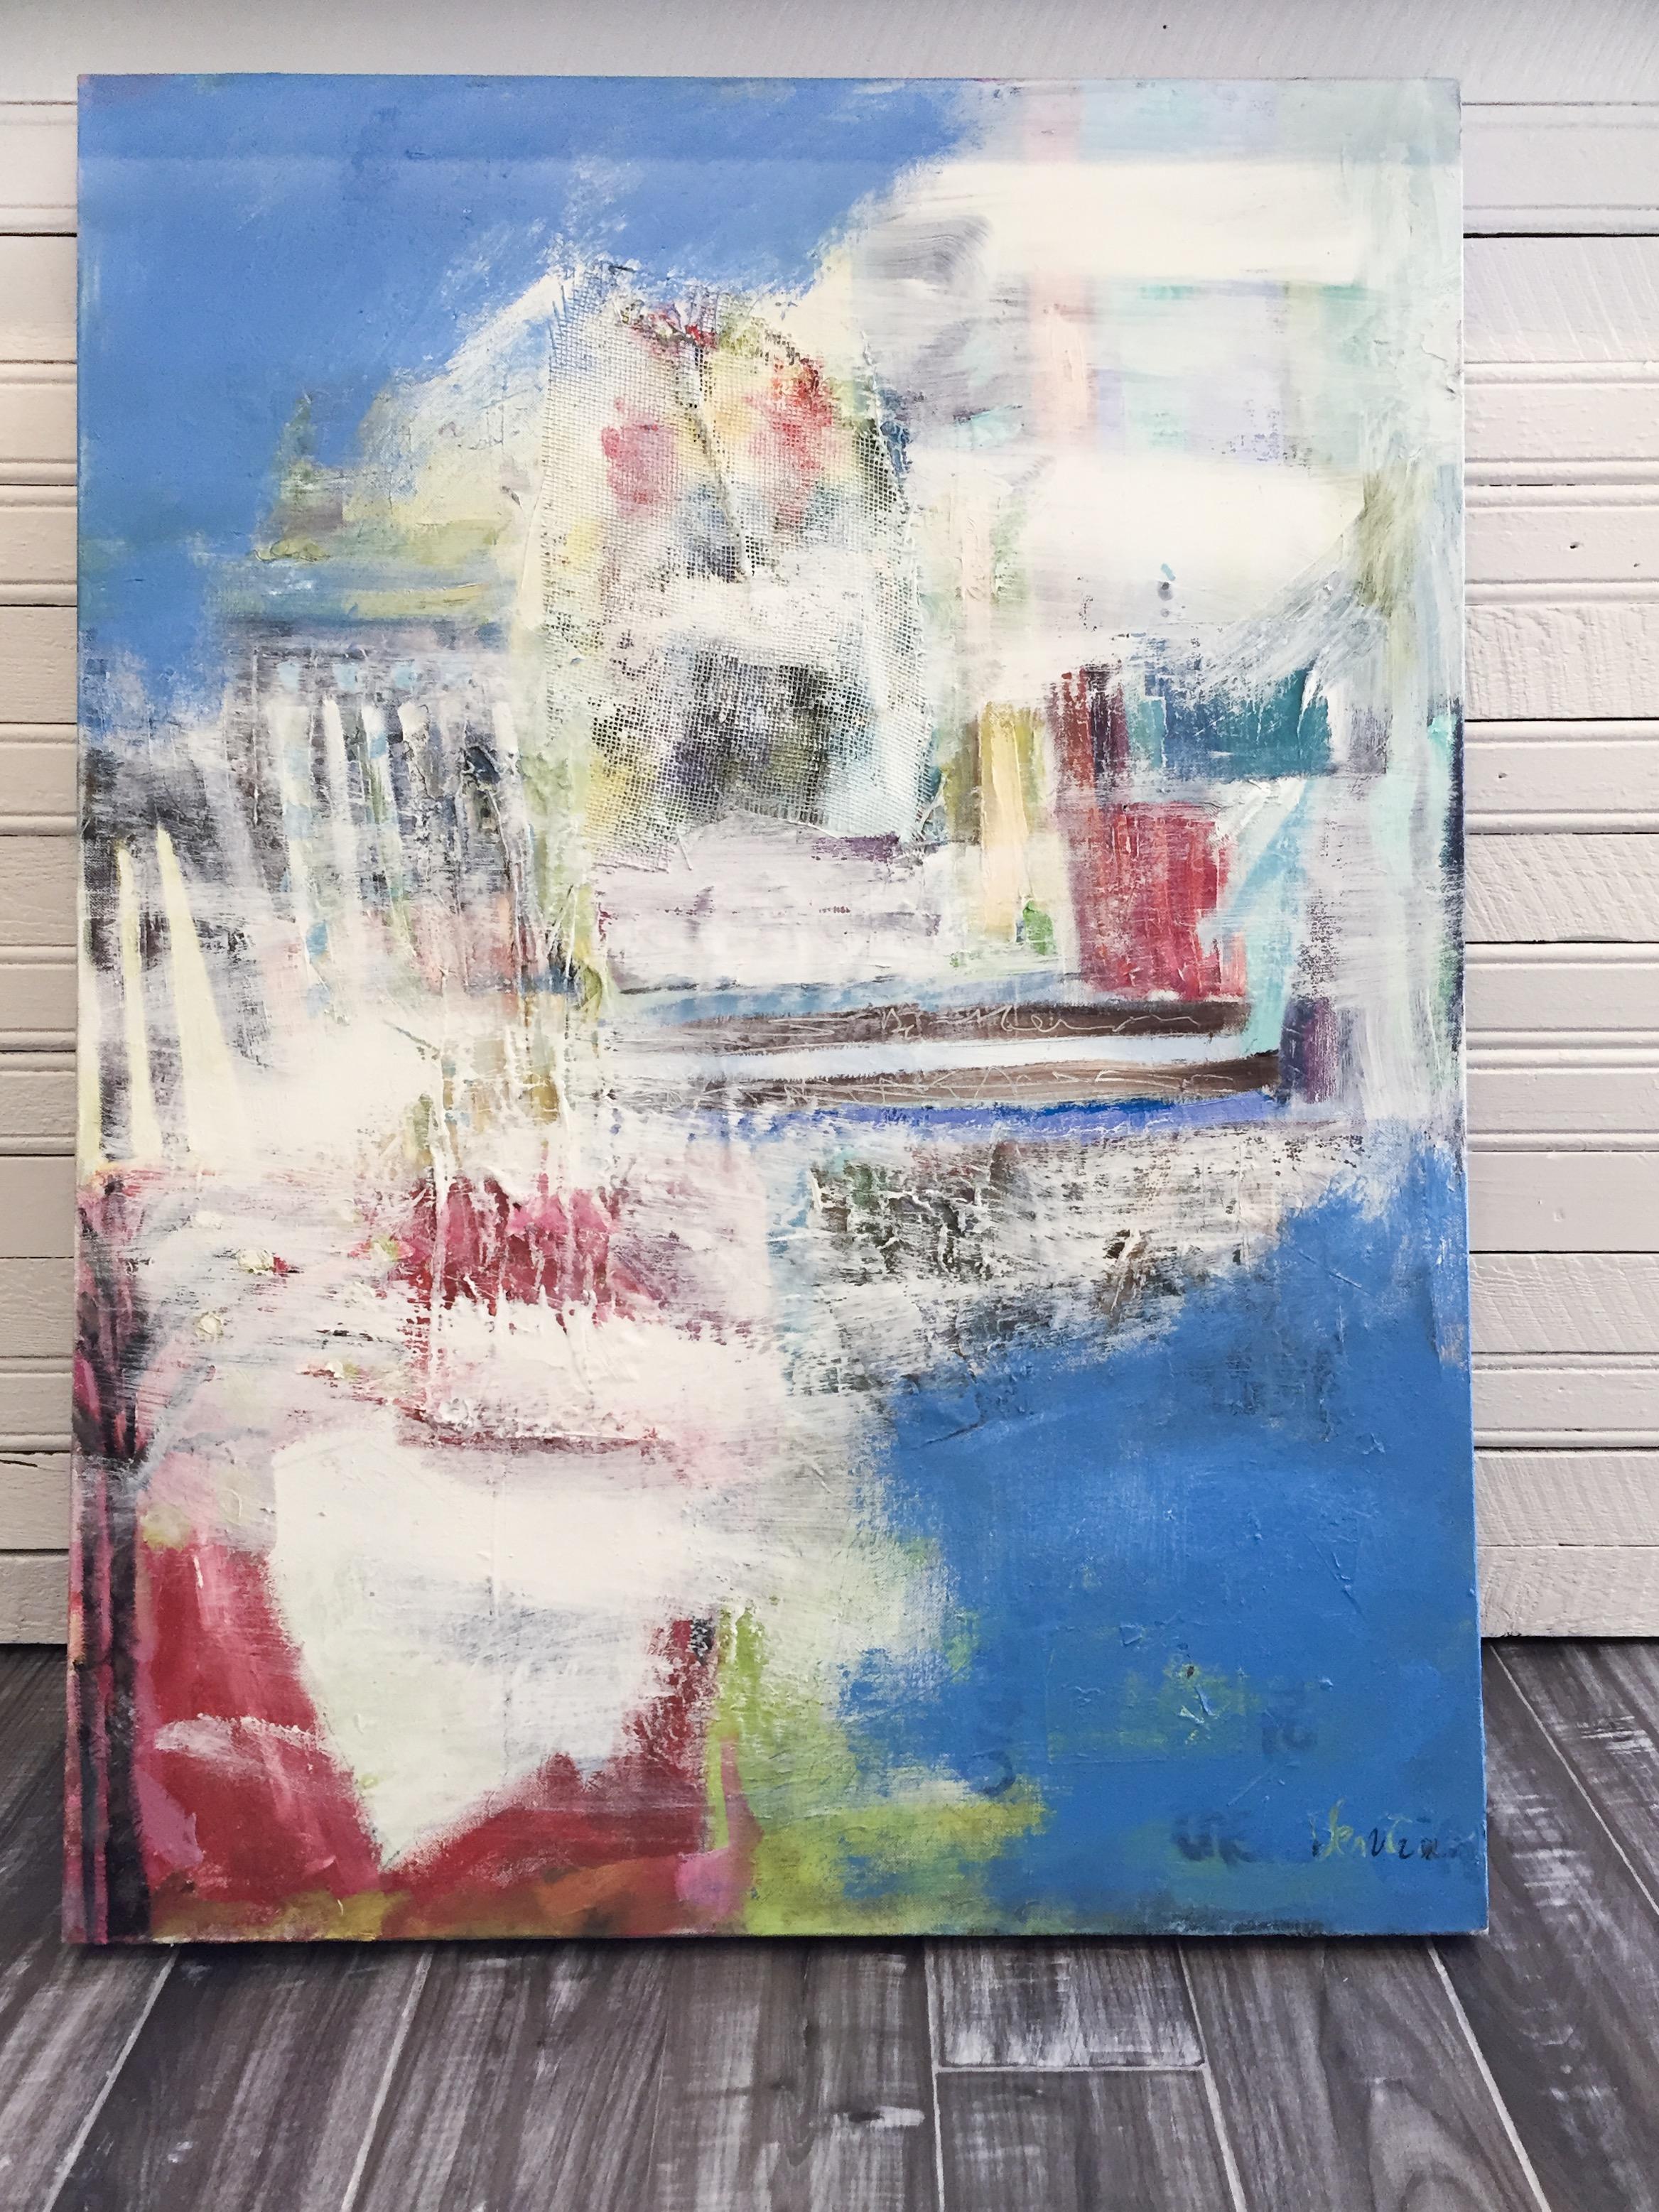 Local artist modern art on canvas.